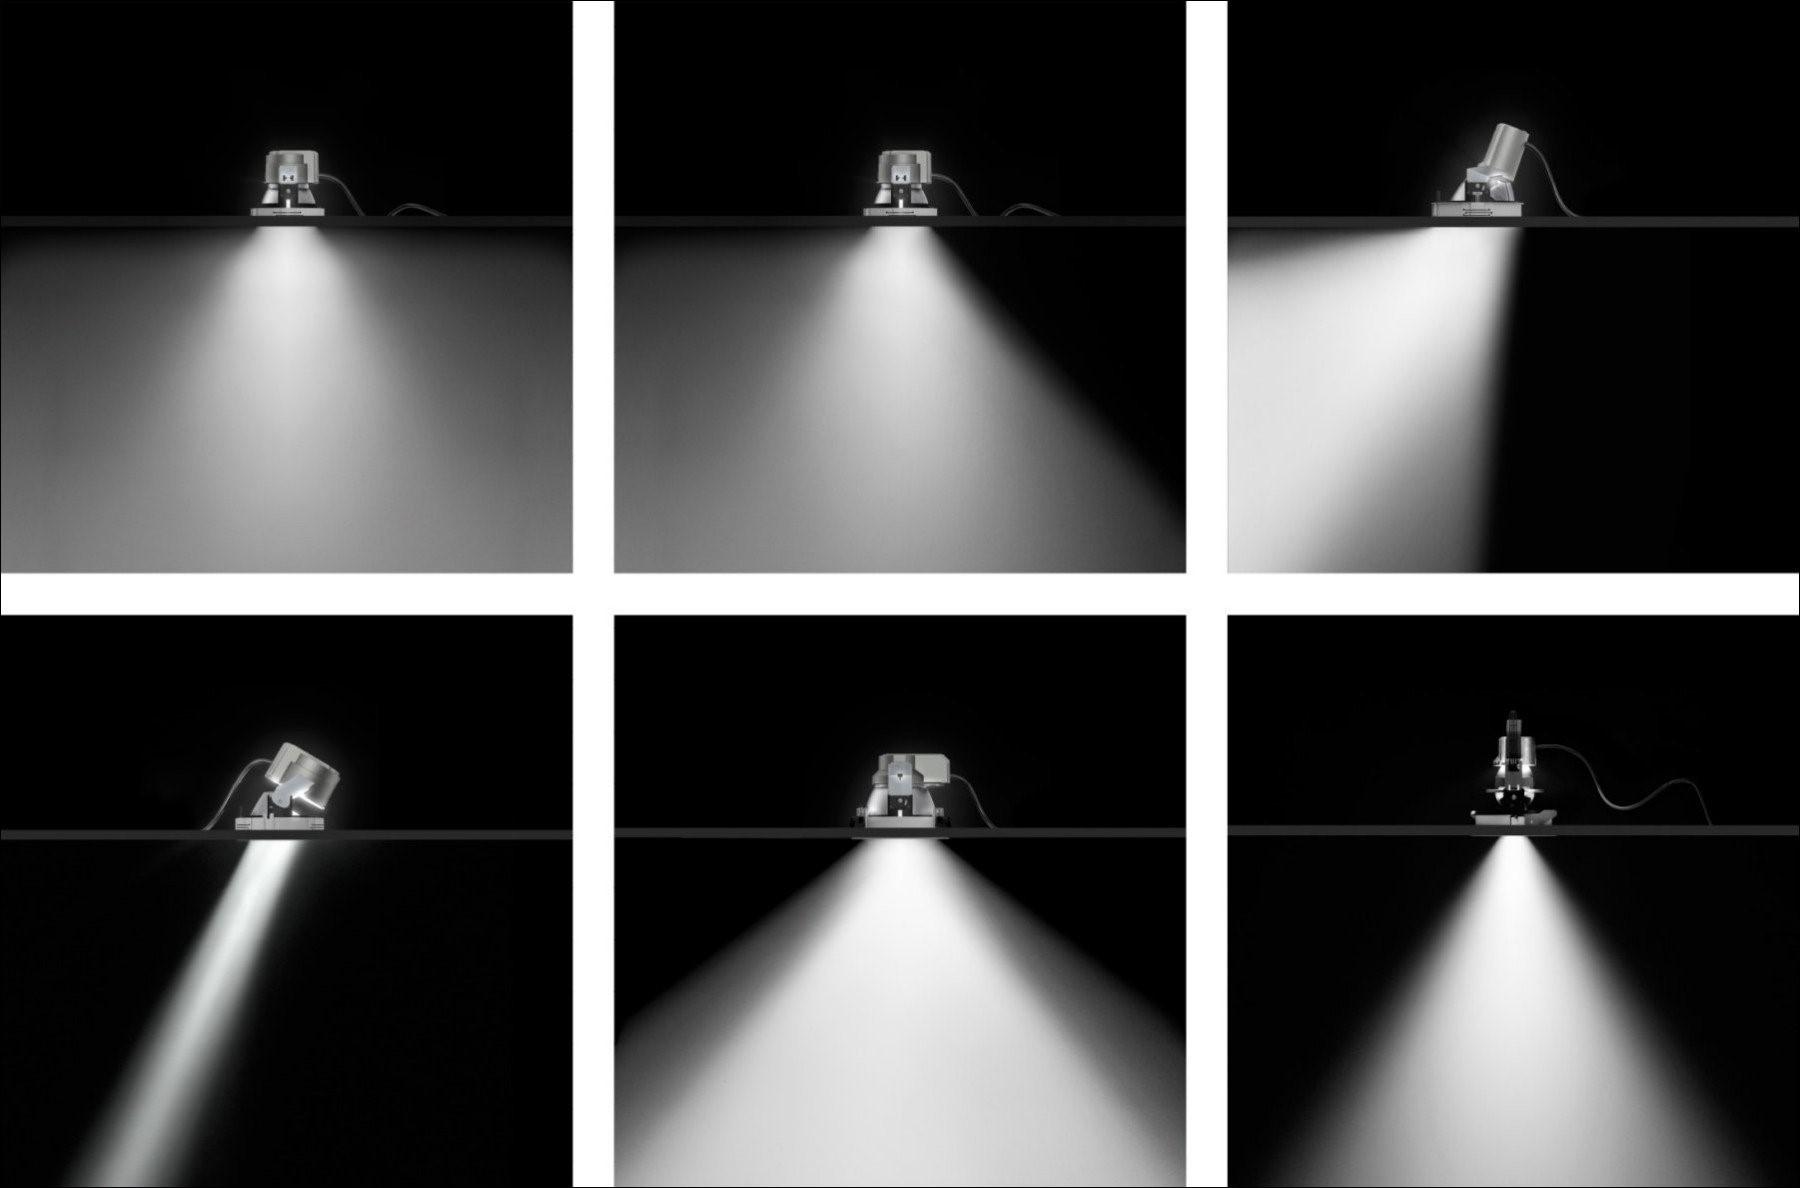 https://www.designbymeyn.com/wp-content/uploads/2015/08/museum-lighting-Erco-Muze-Aydinlatmalari.jpg